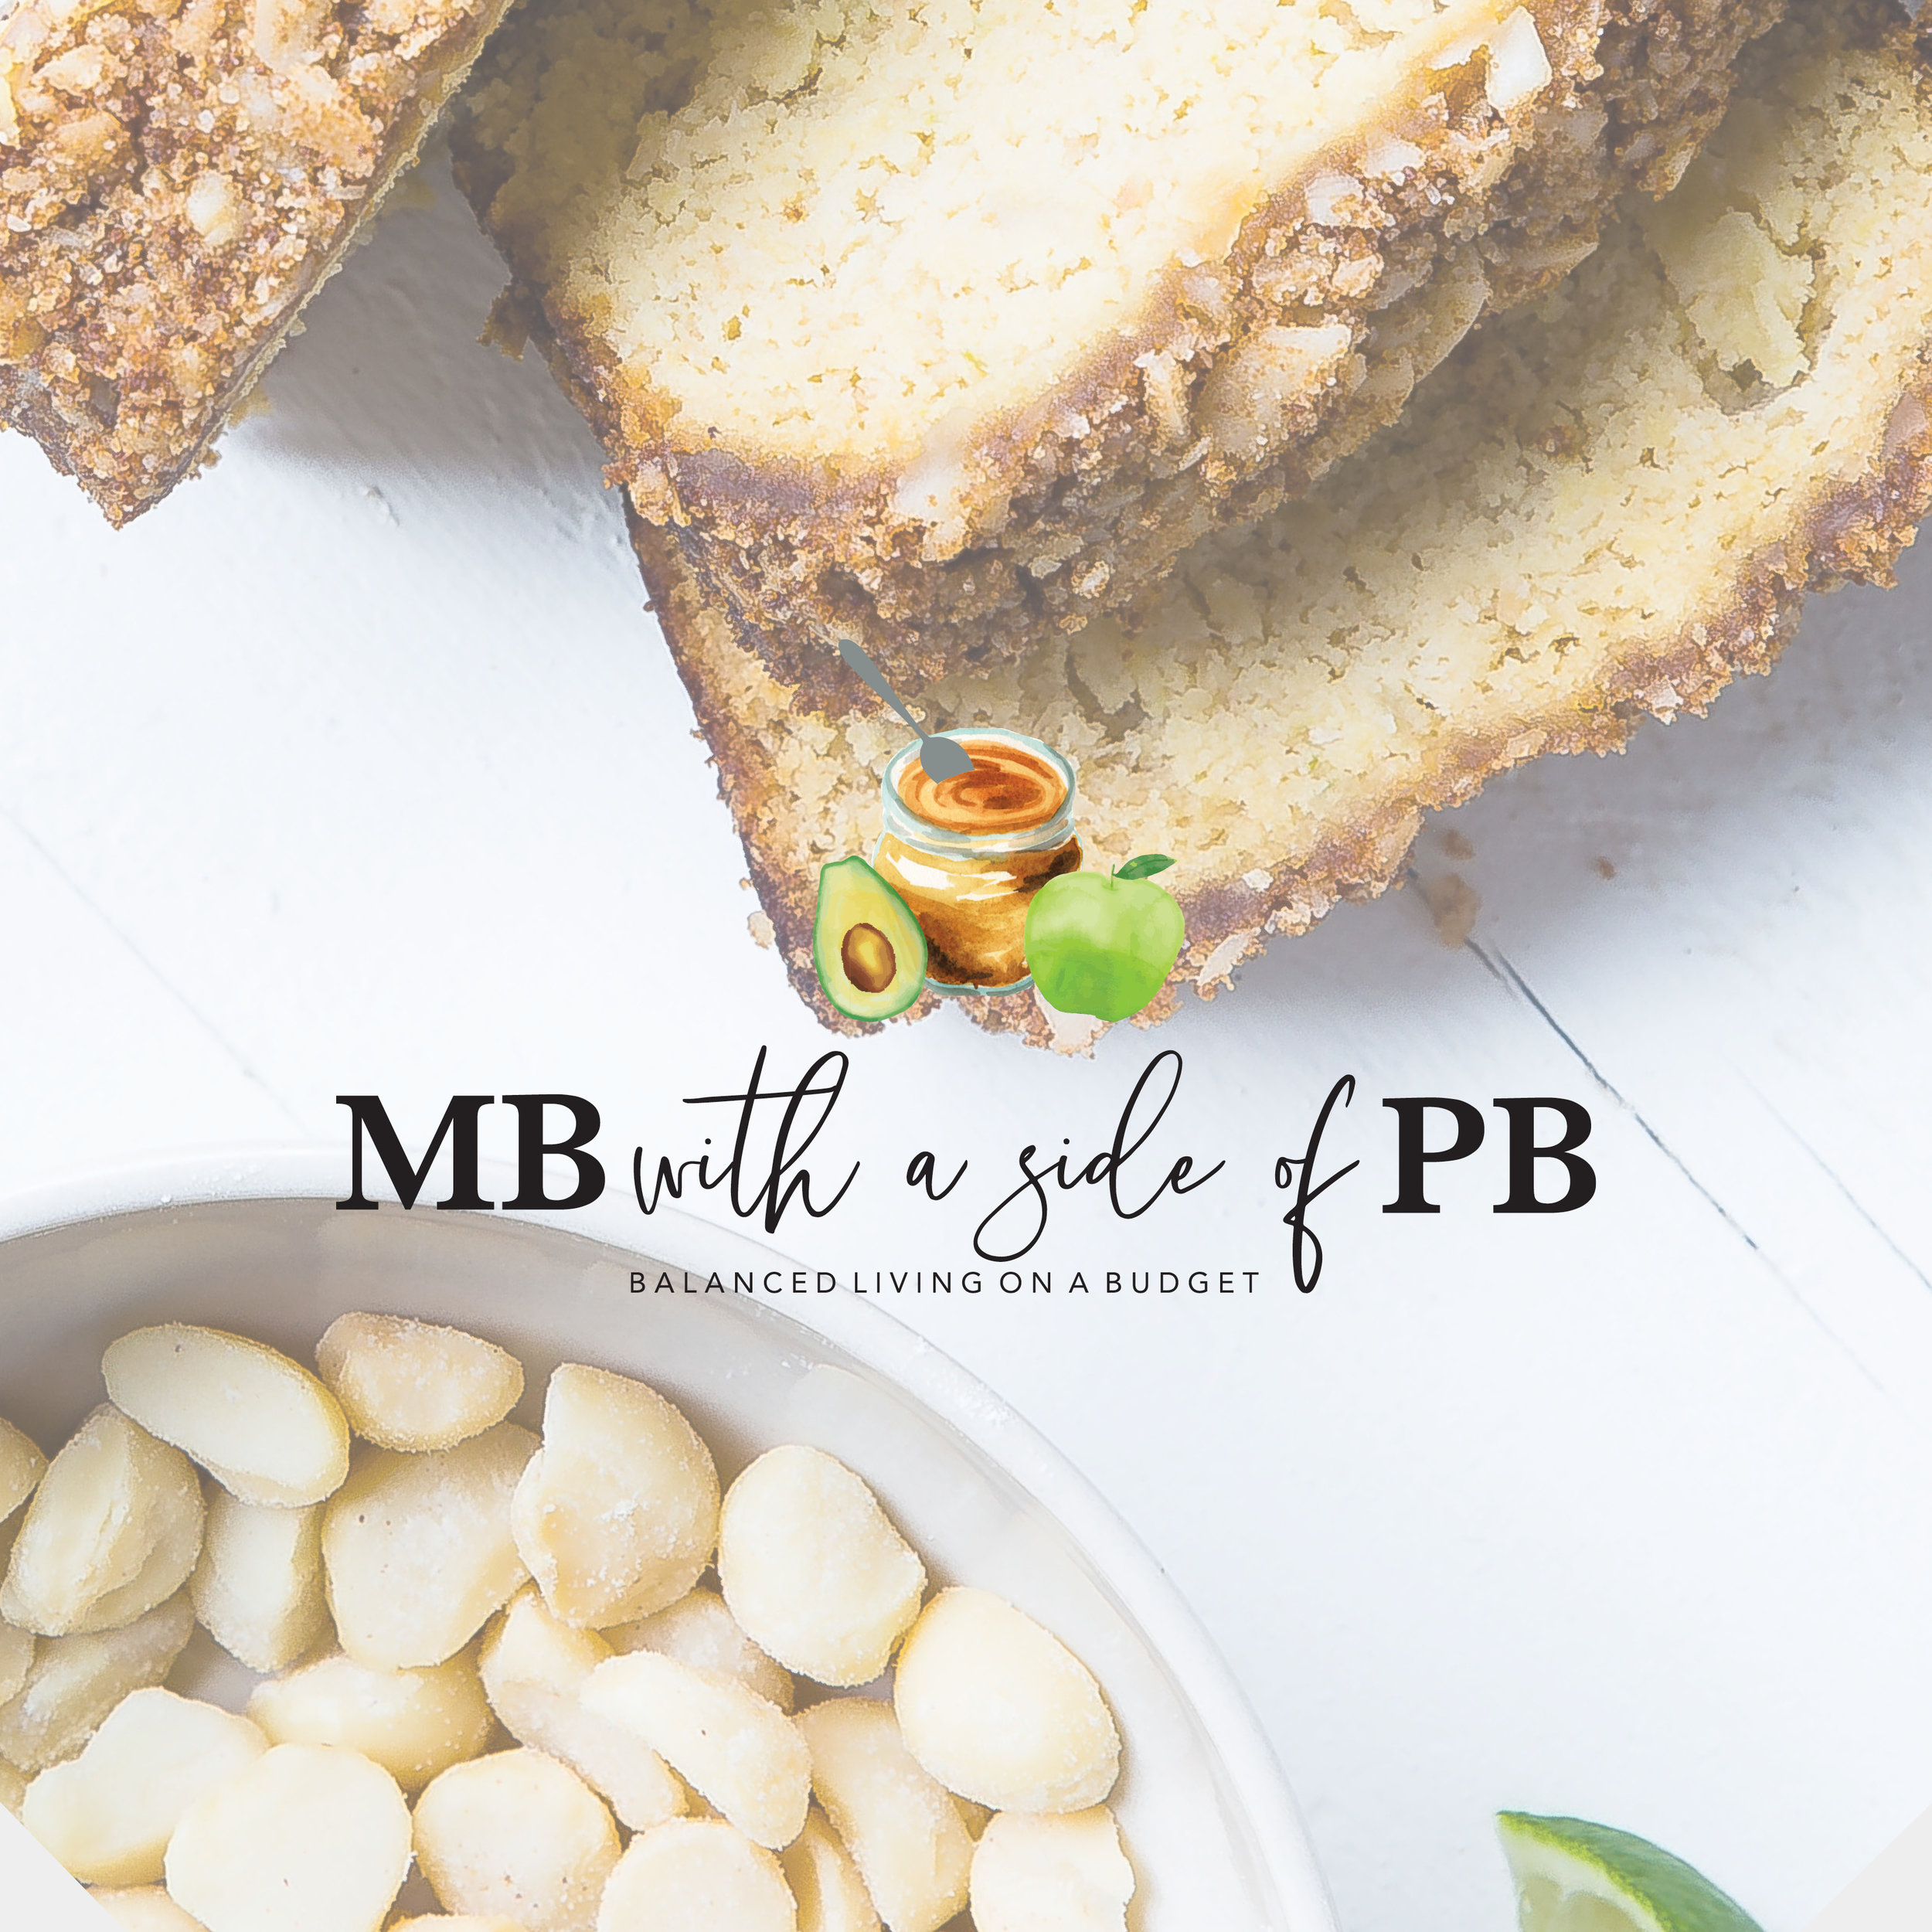 MBwithasideofPB-Brand3.jpg